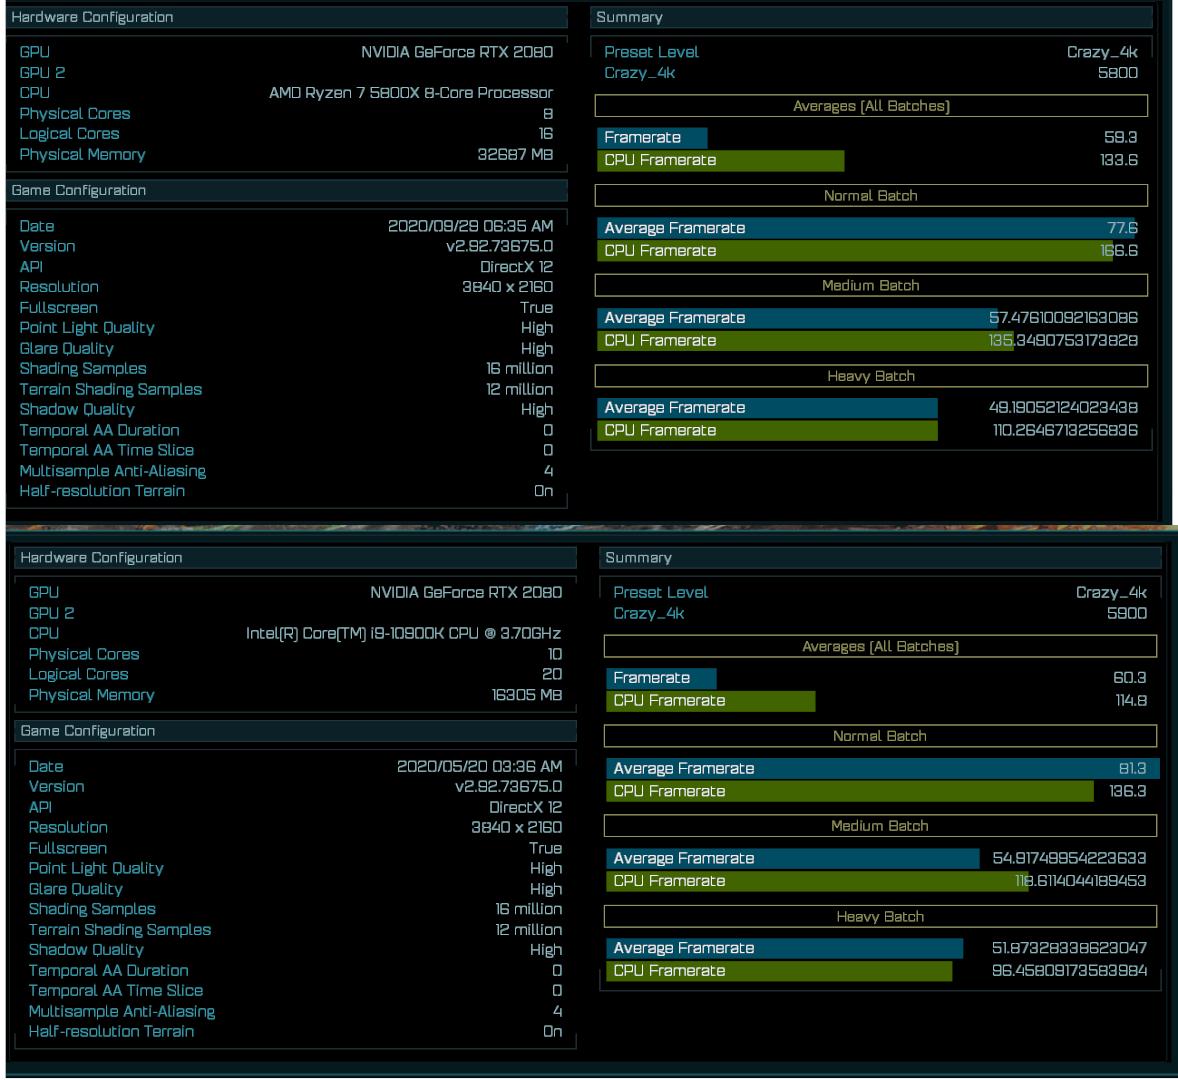 AMD Ryzen 7 5800X Beats the Intel Core i9-10900K in Leaked Gaming Benchmark